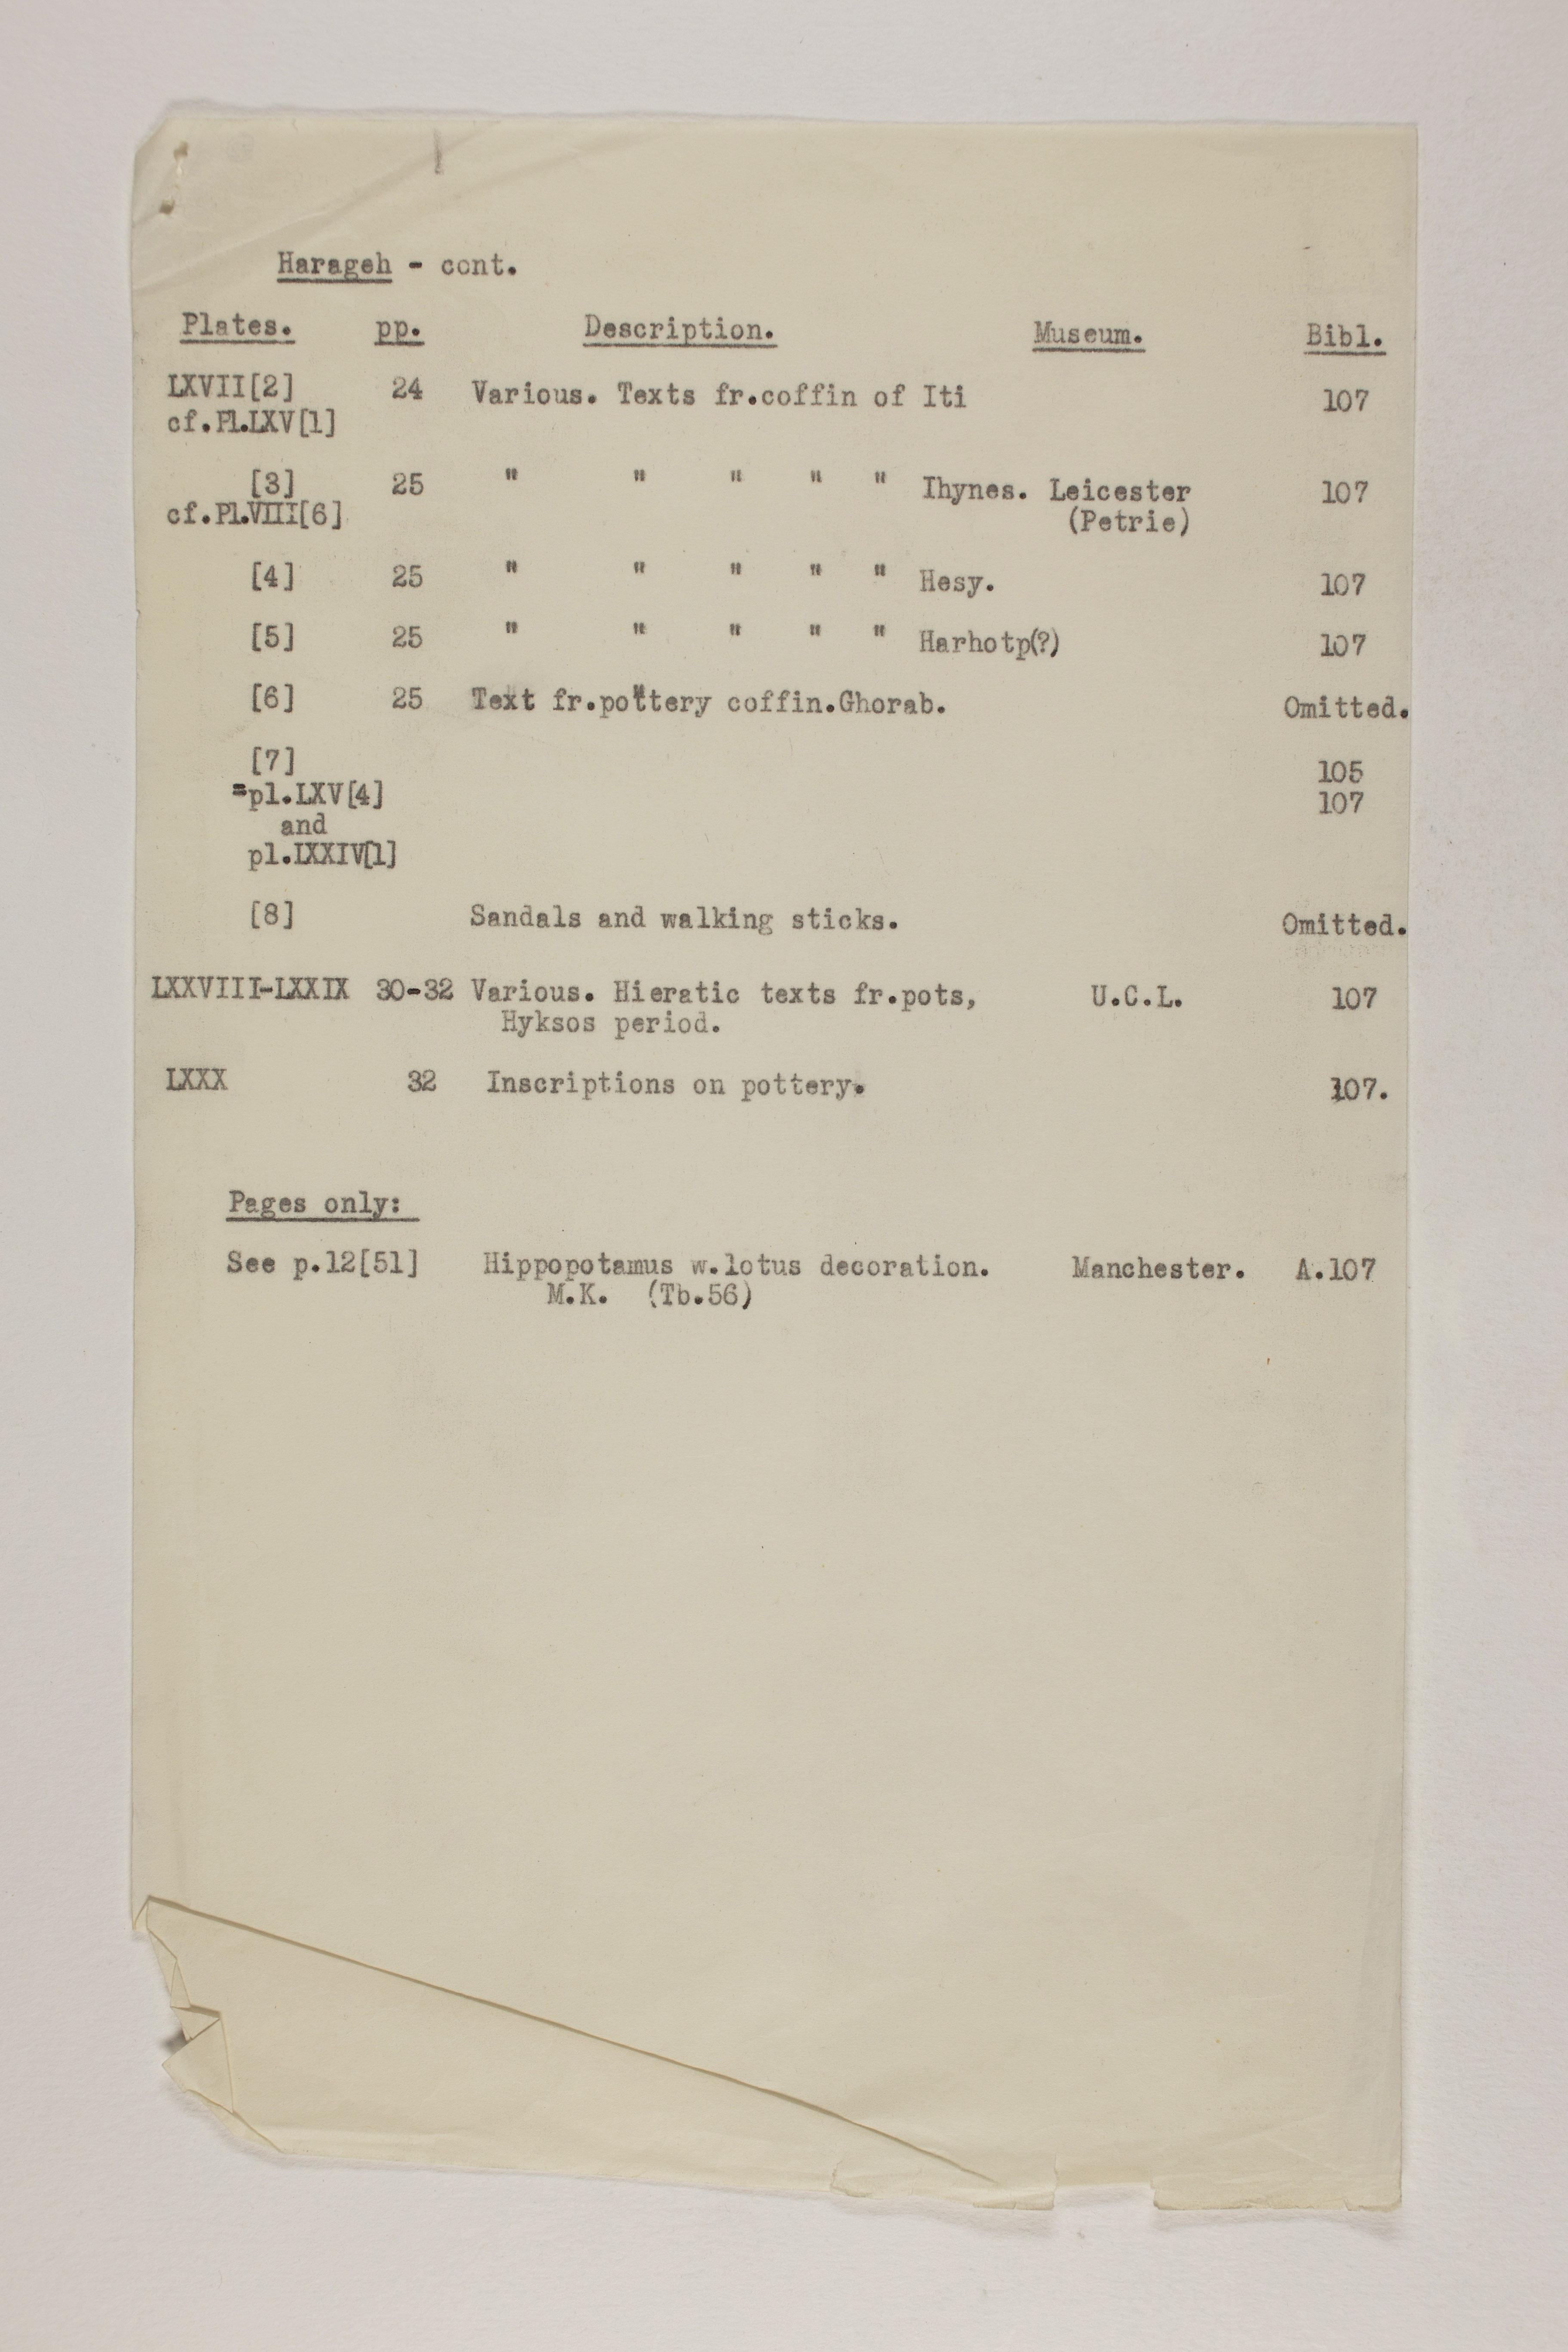 1913-14 Lahun, Haraga Object list PMA/WFP1/D/22/72.4